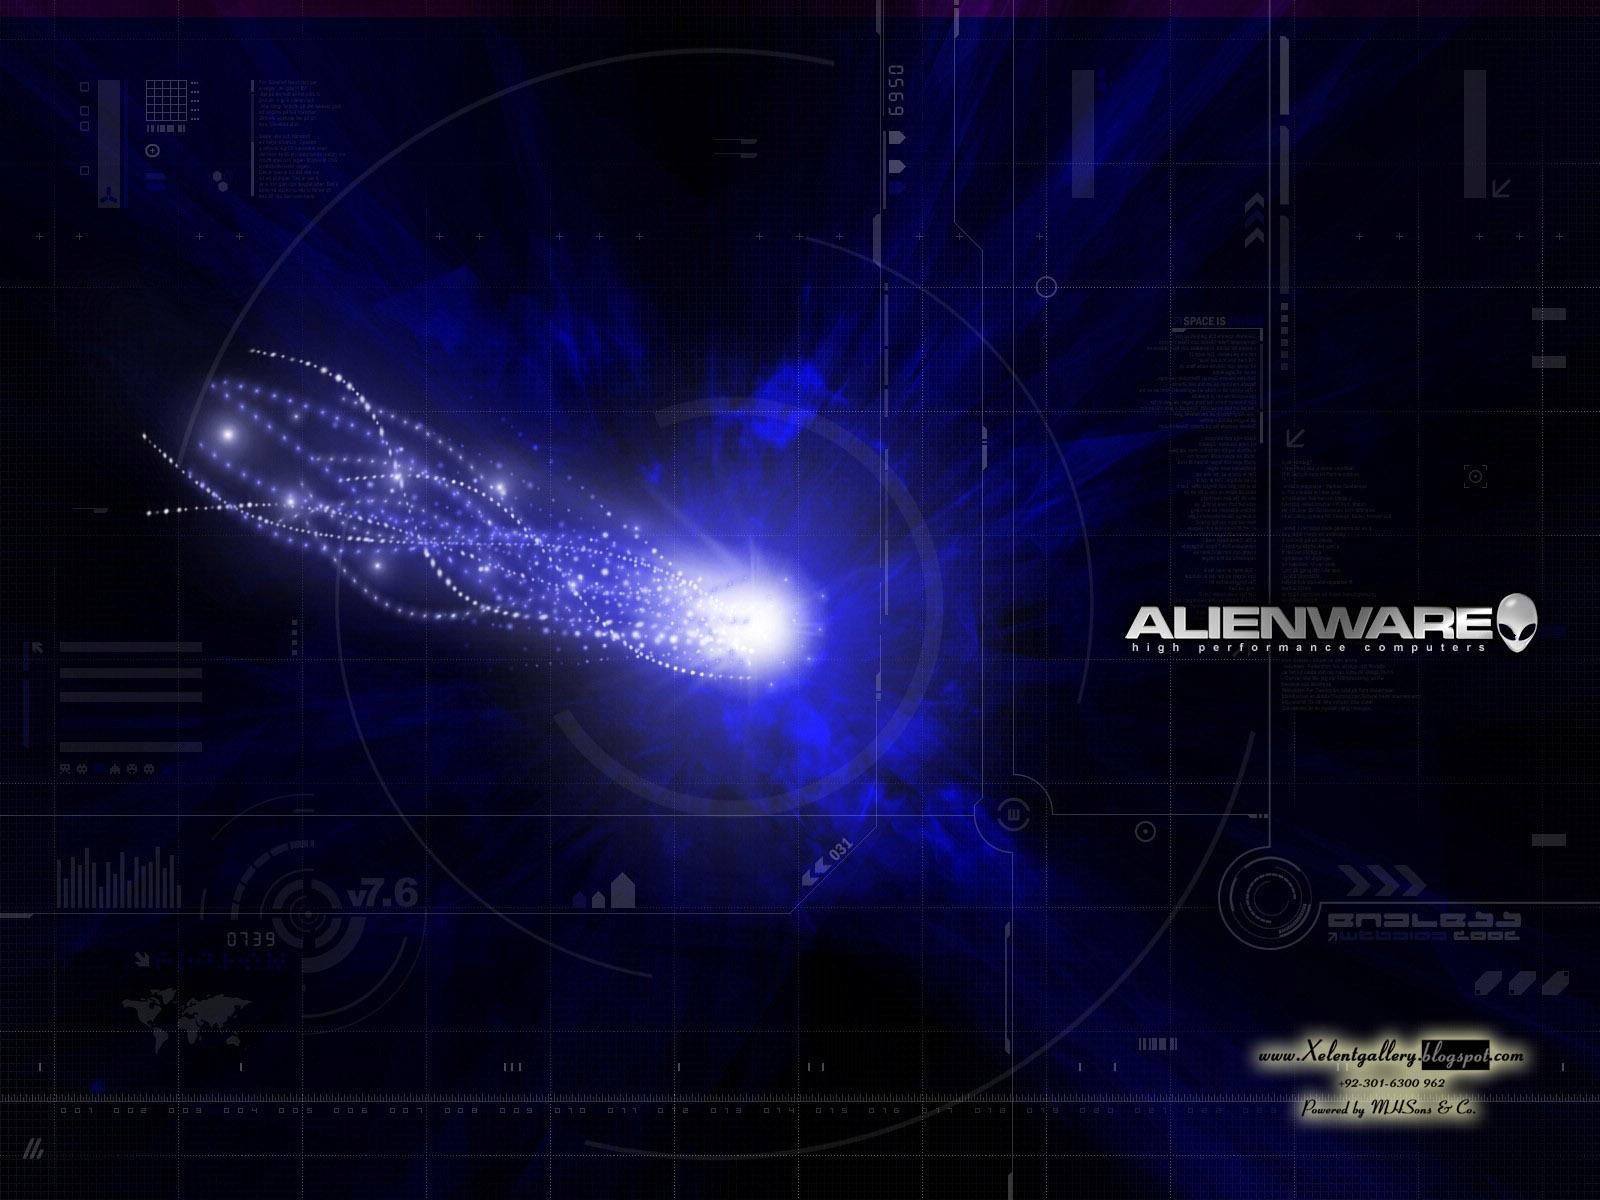 Alienware Wallpapers 1080p HD Walls Find Wallpapers 1600x1200